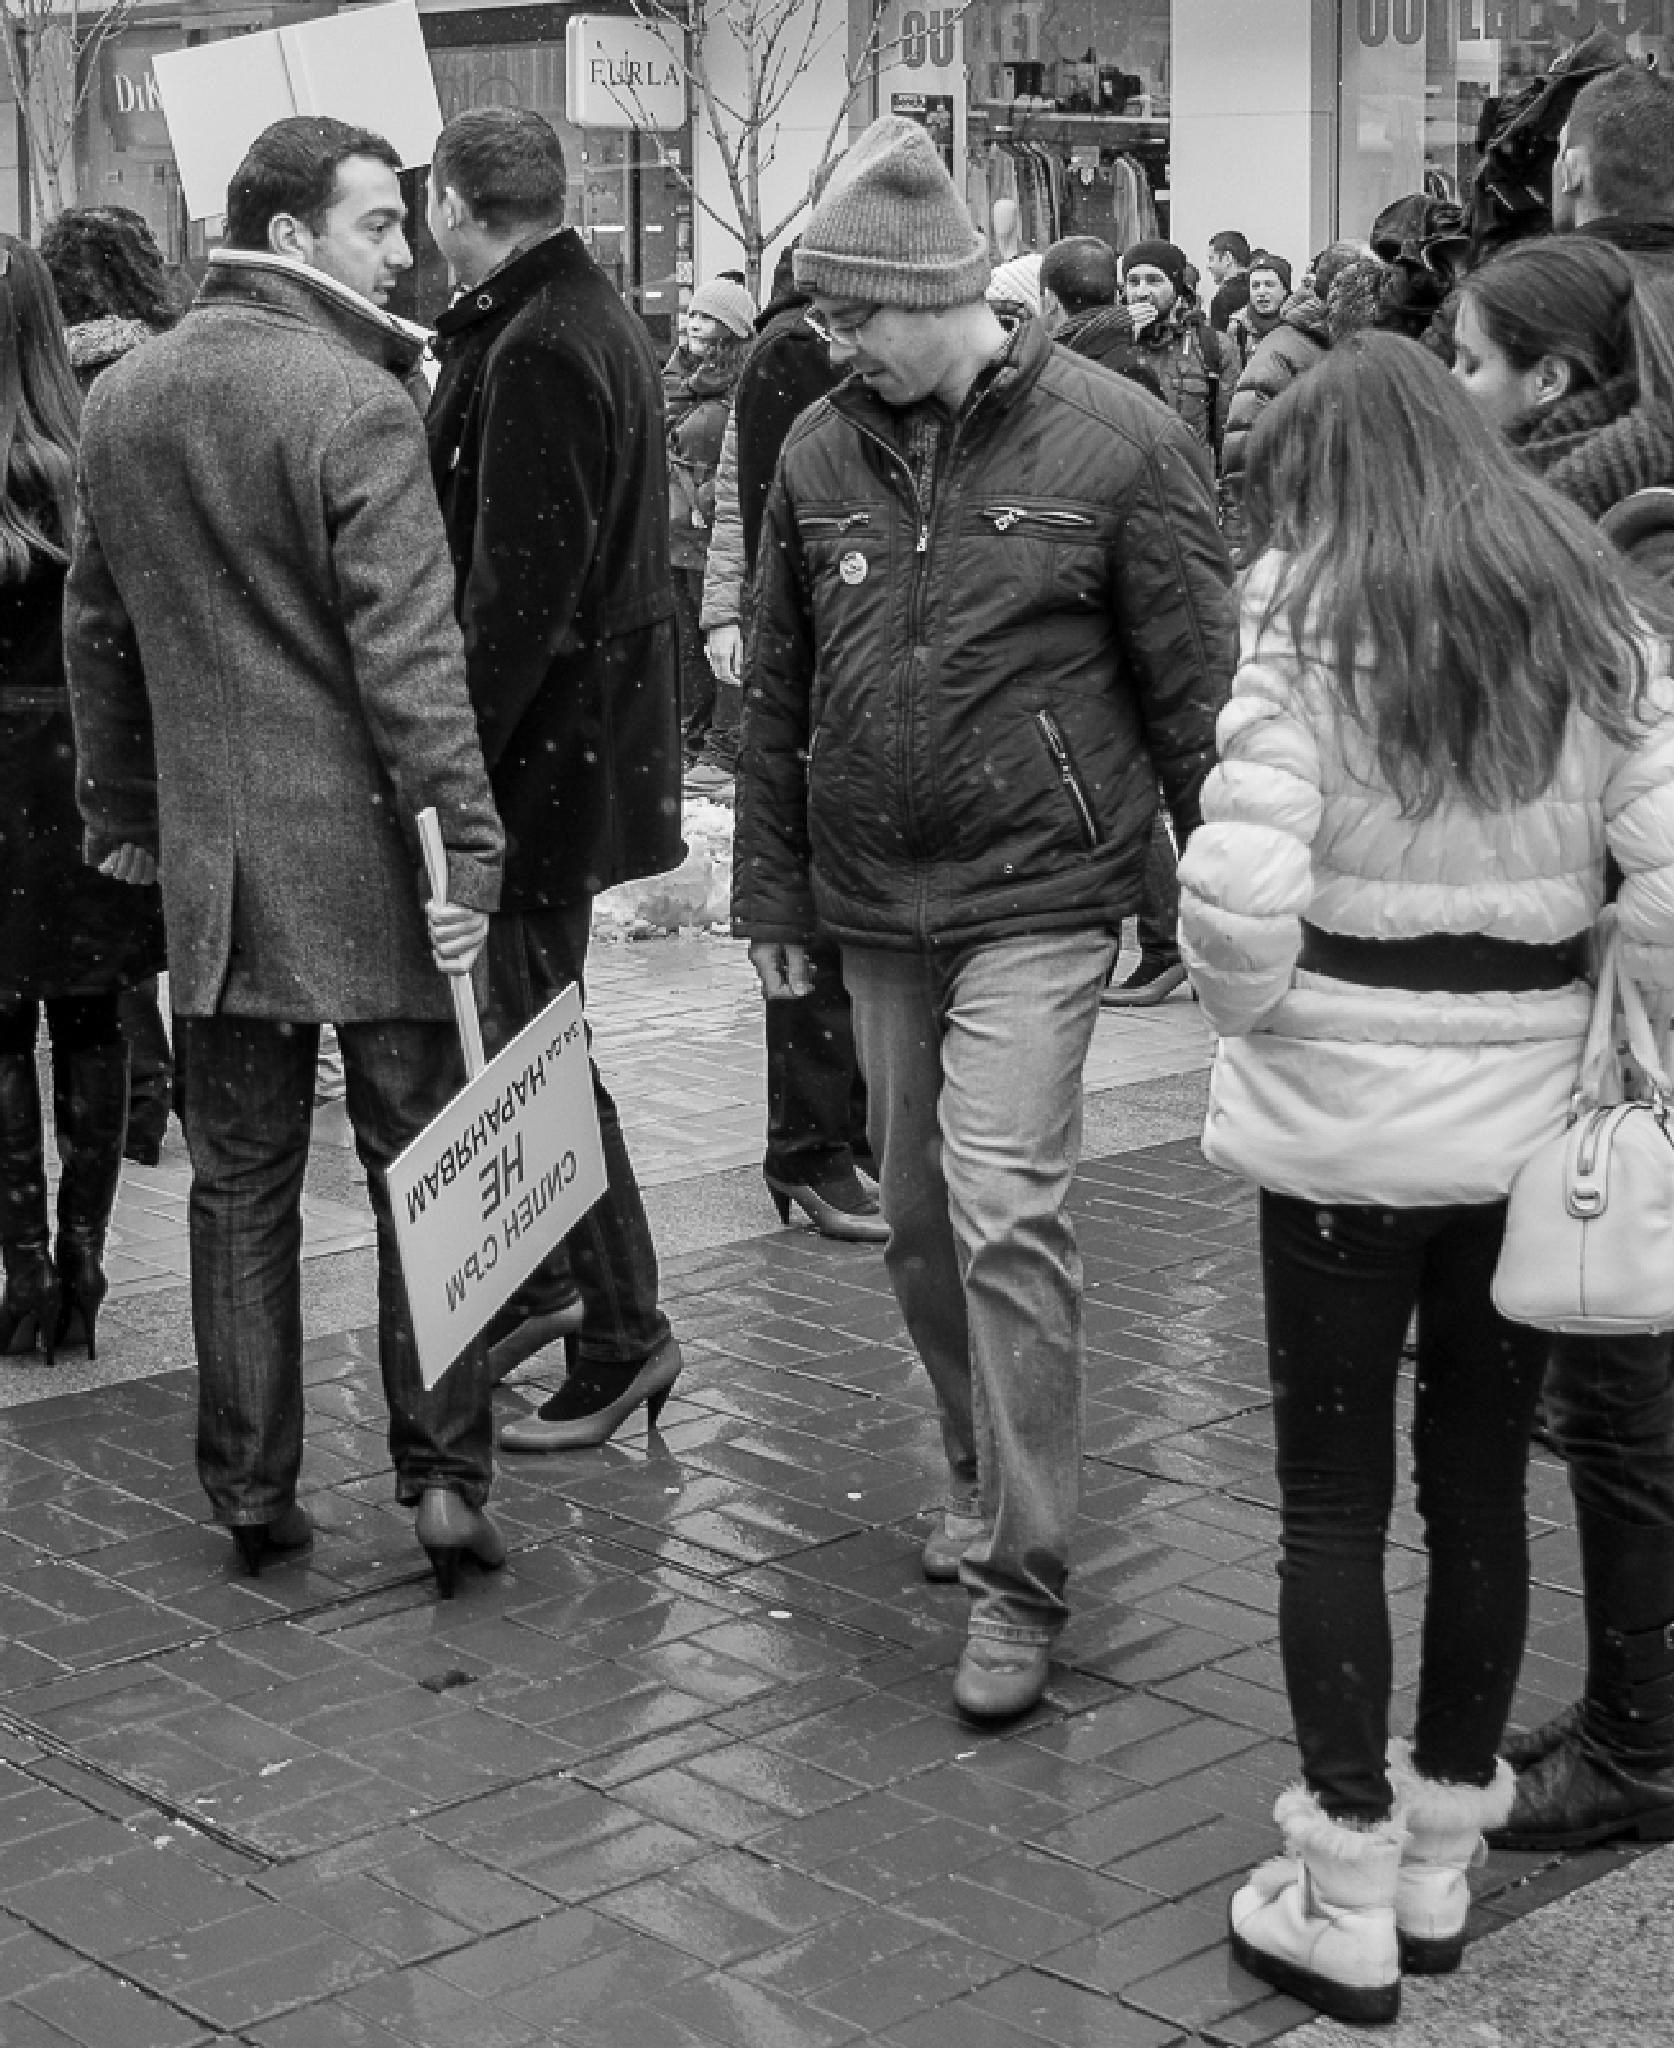 8-th of March, Sofia, Bulgaria by Mihail Dimitrov